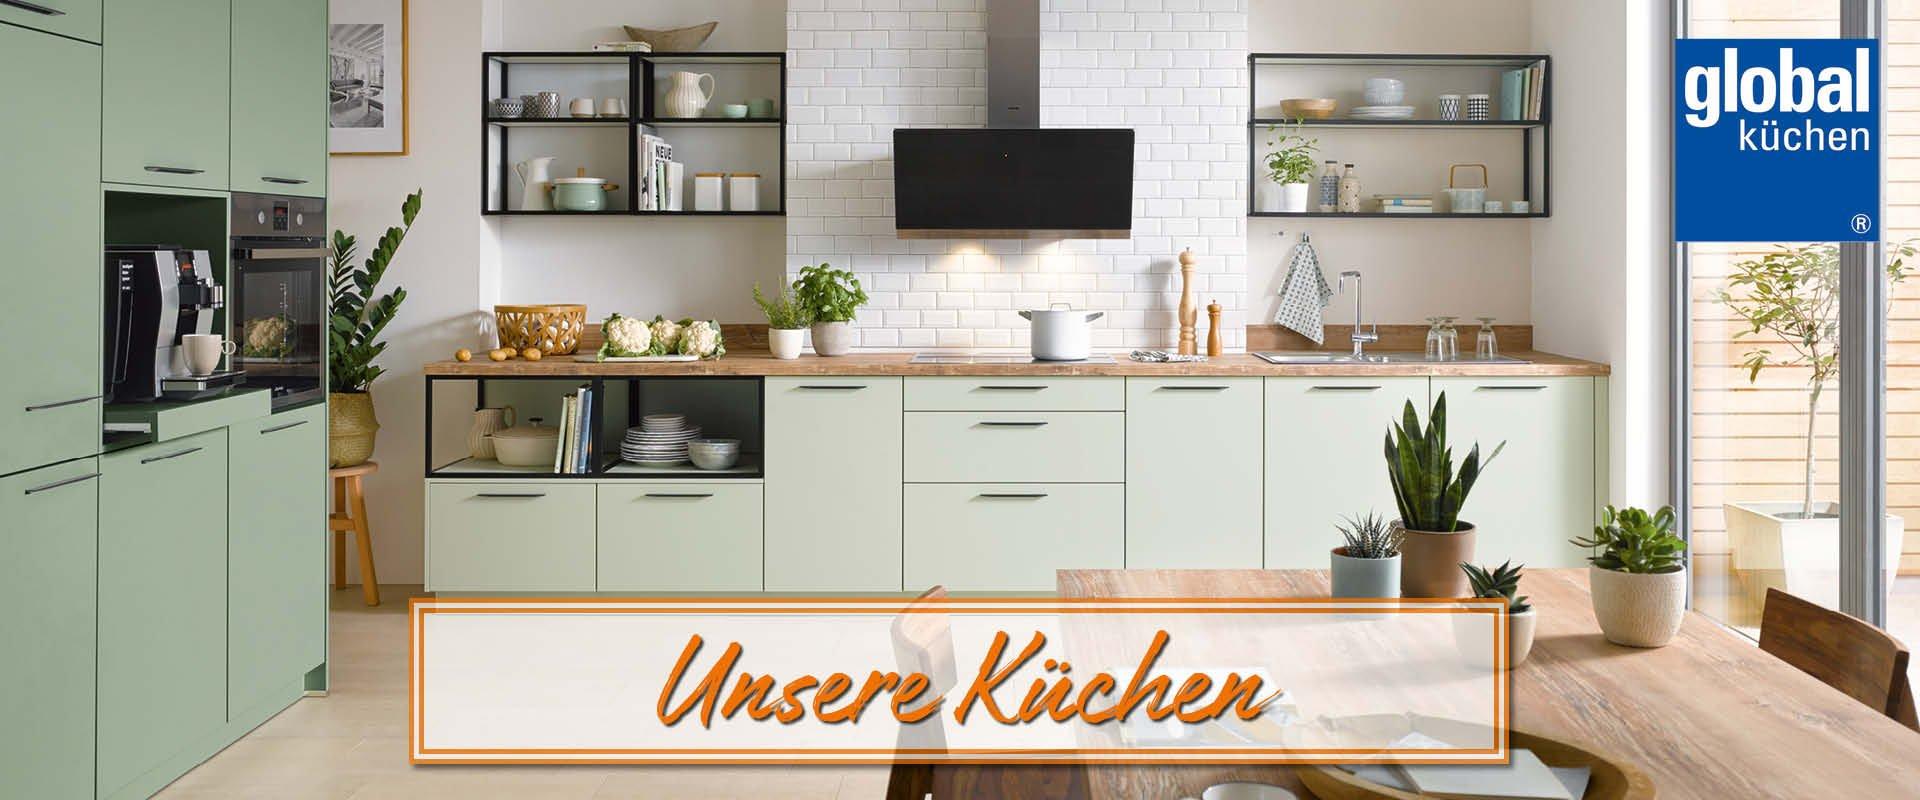 Full Size of Küche Selber Planen Online Günstige Küche Selber Planen Wie Kann Ich Meine Küche Selber Planen Küche Selber Planen Programm Küche Küche Selber Planen